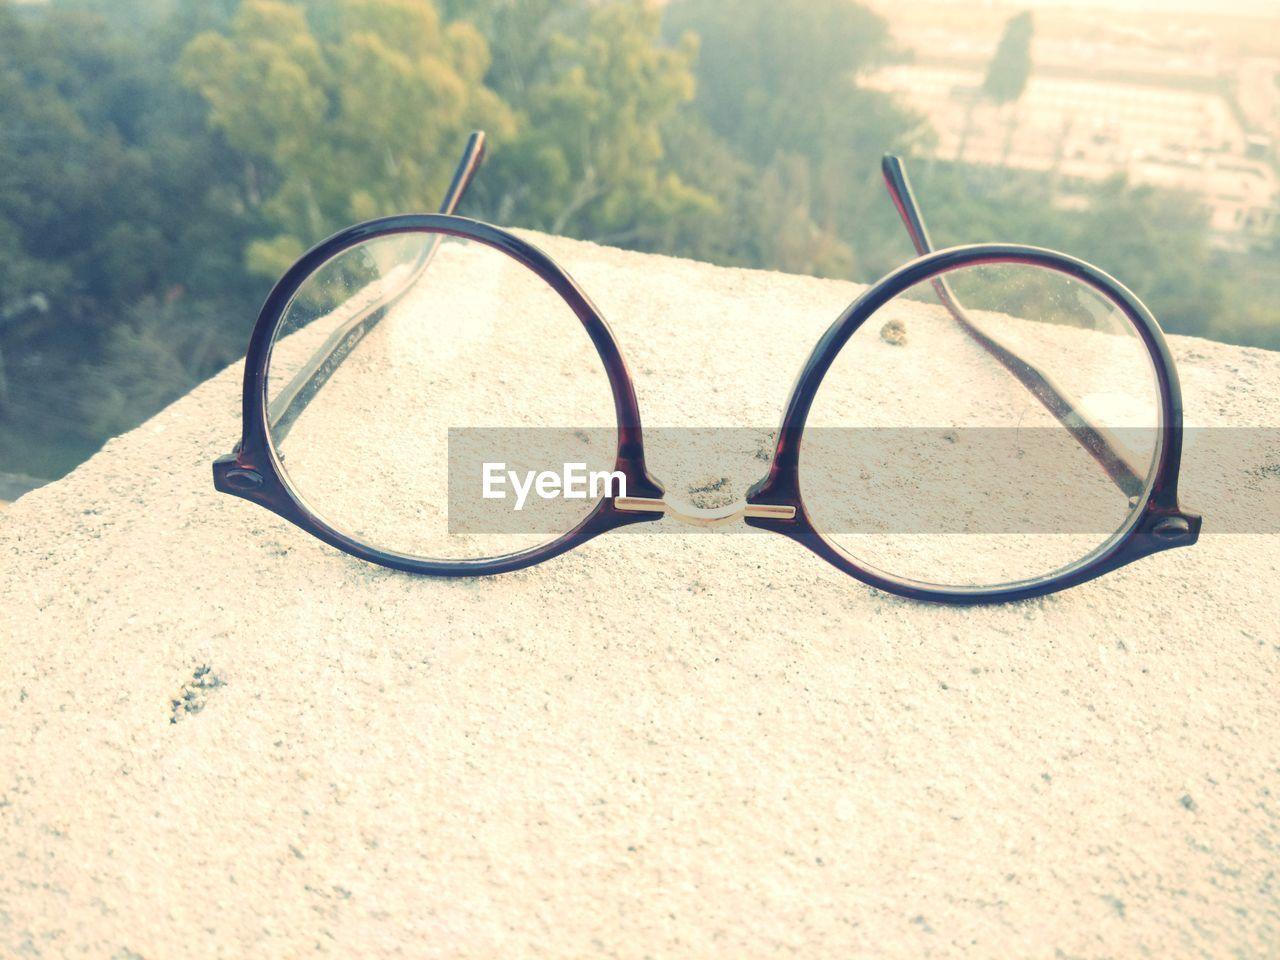 eyeglasses, vision, eyewear, glasses, no people, day, outdoors, sand, nature, focus on foreground, eyesight, close-up